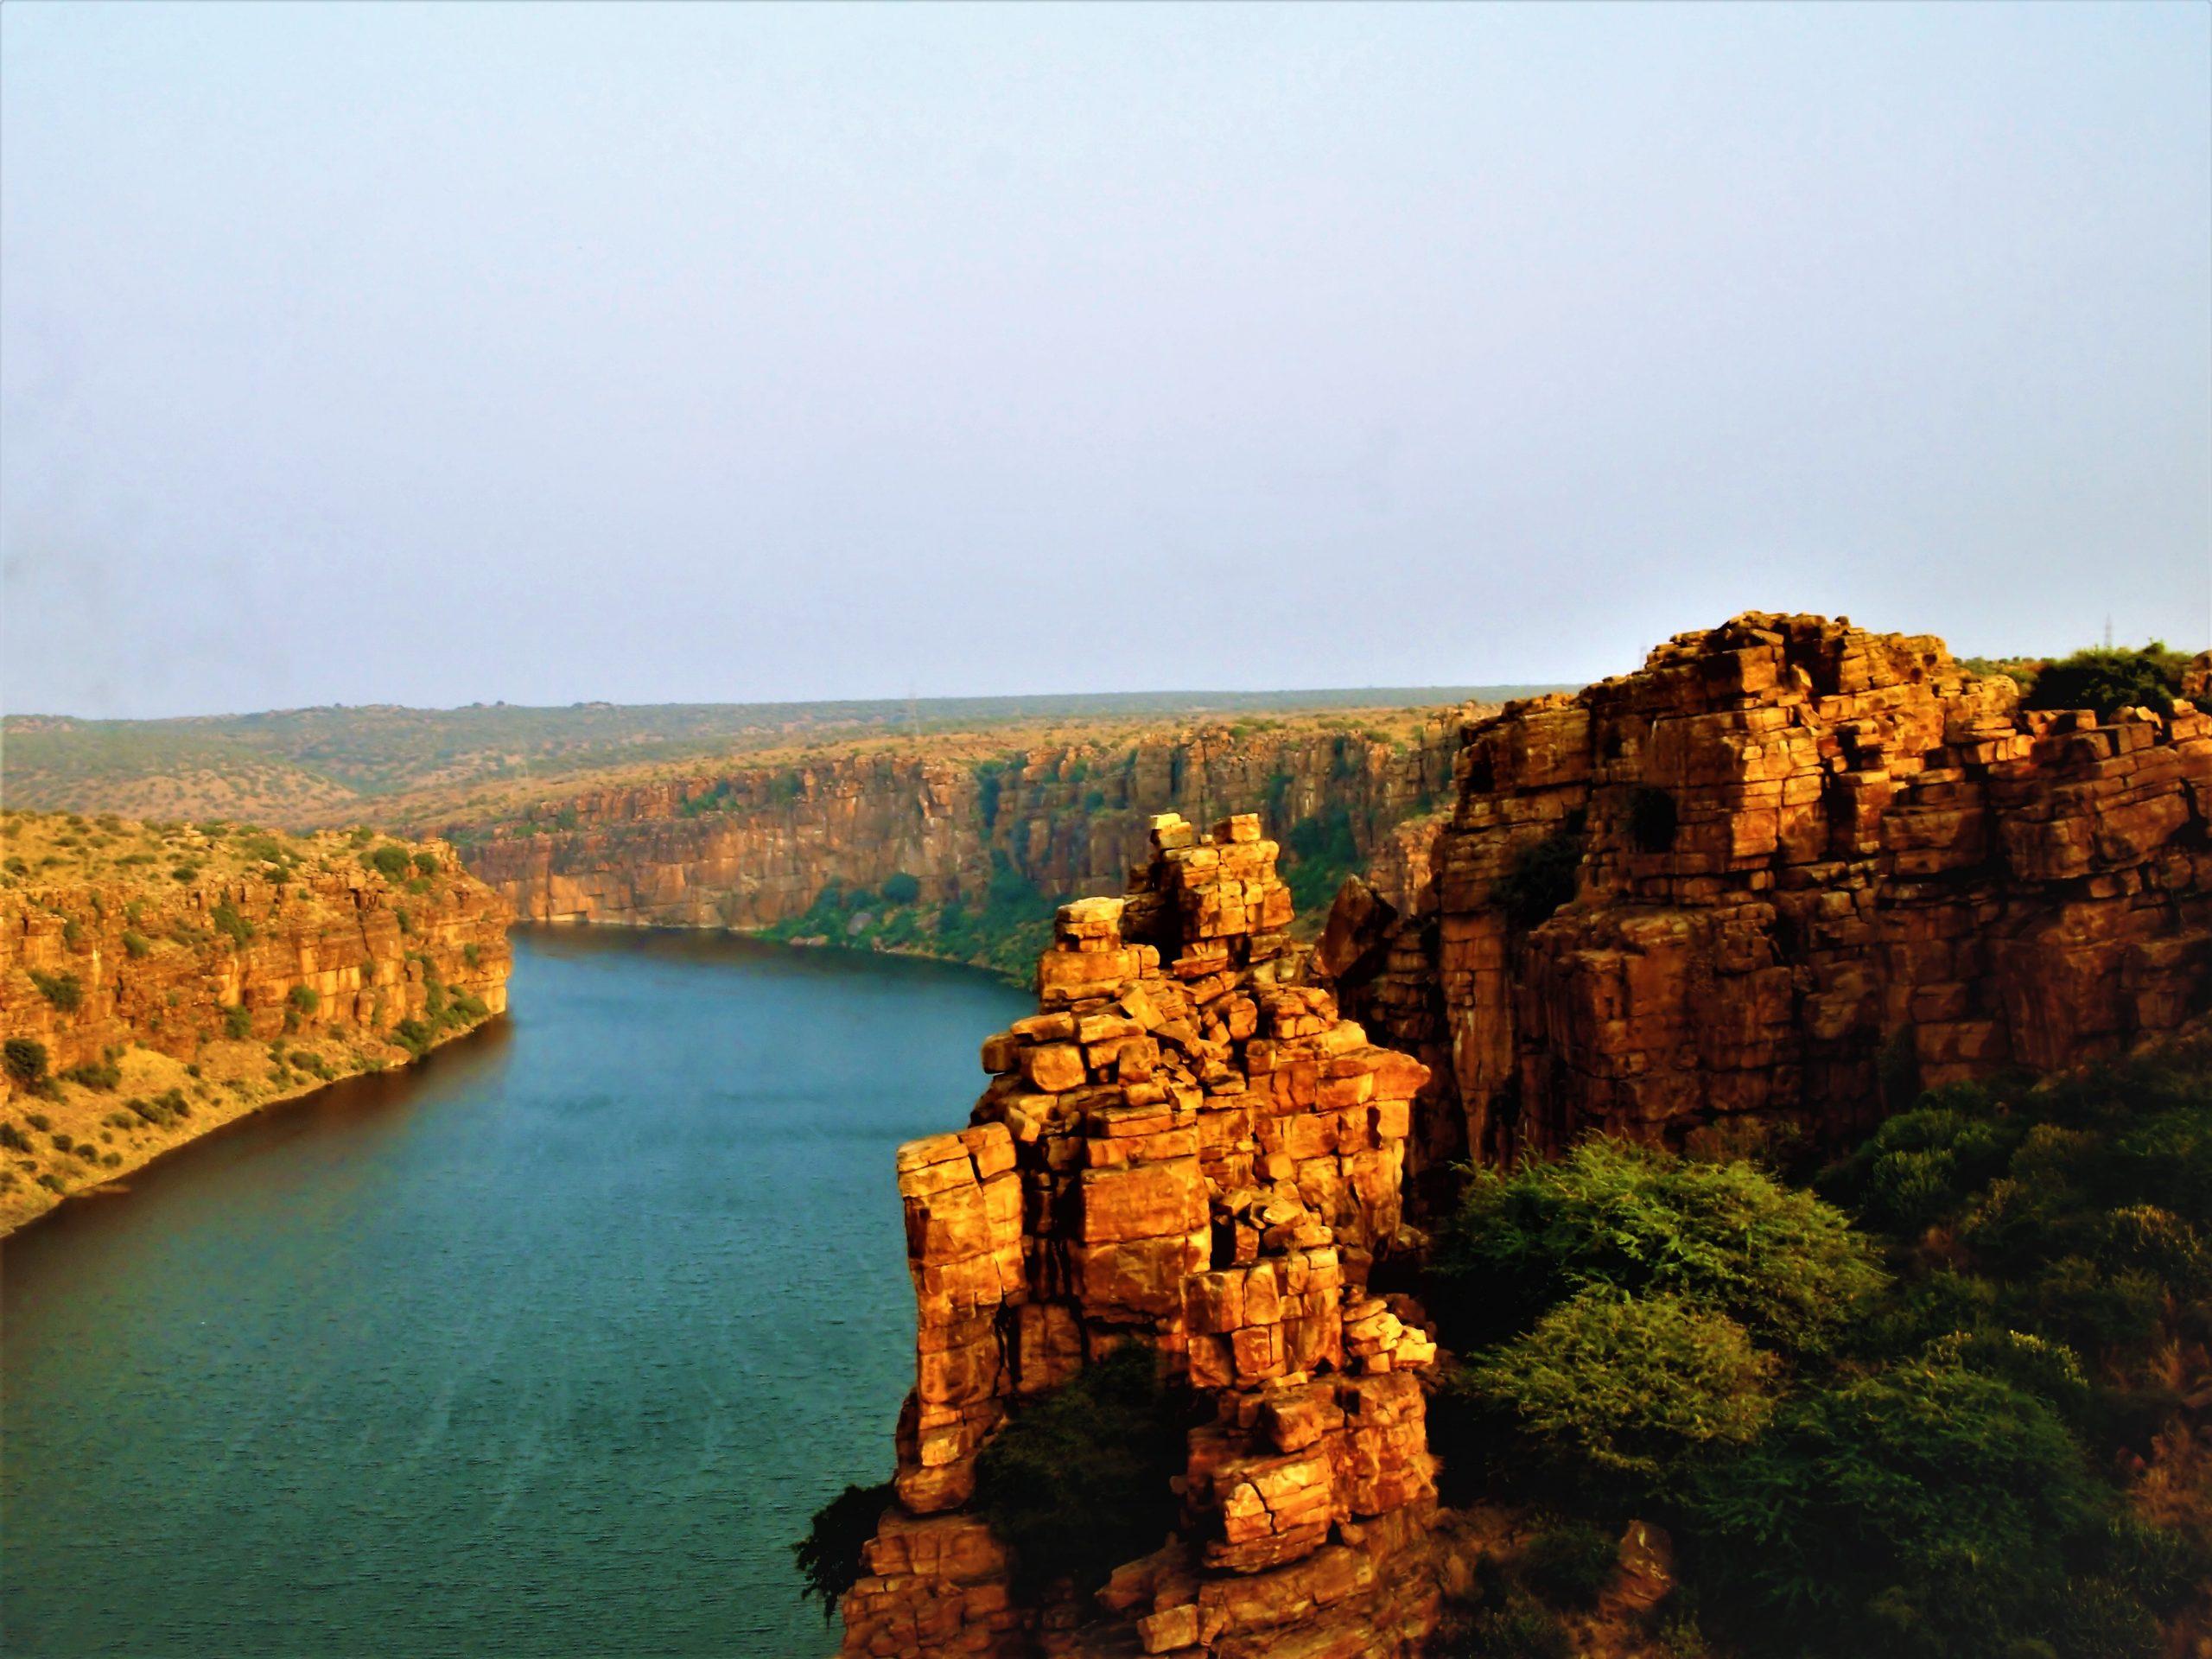 'Grand Canyon of India at Gandikota, Andhra Prades